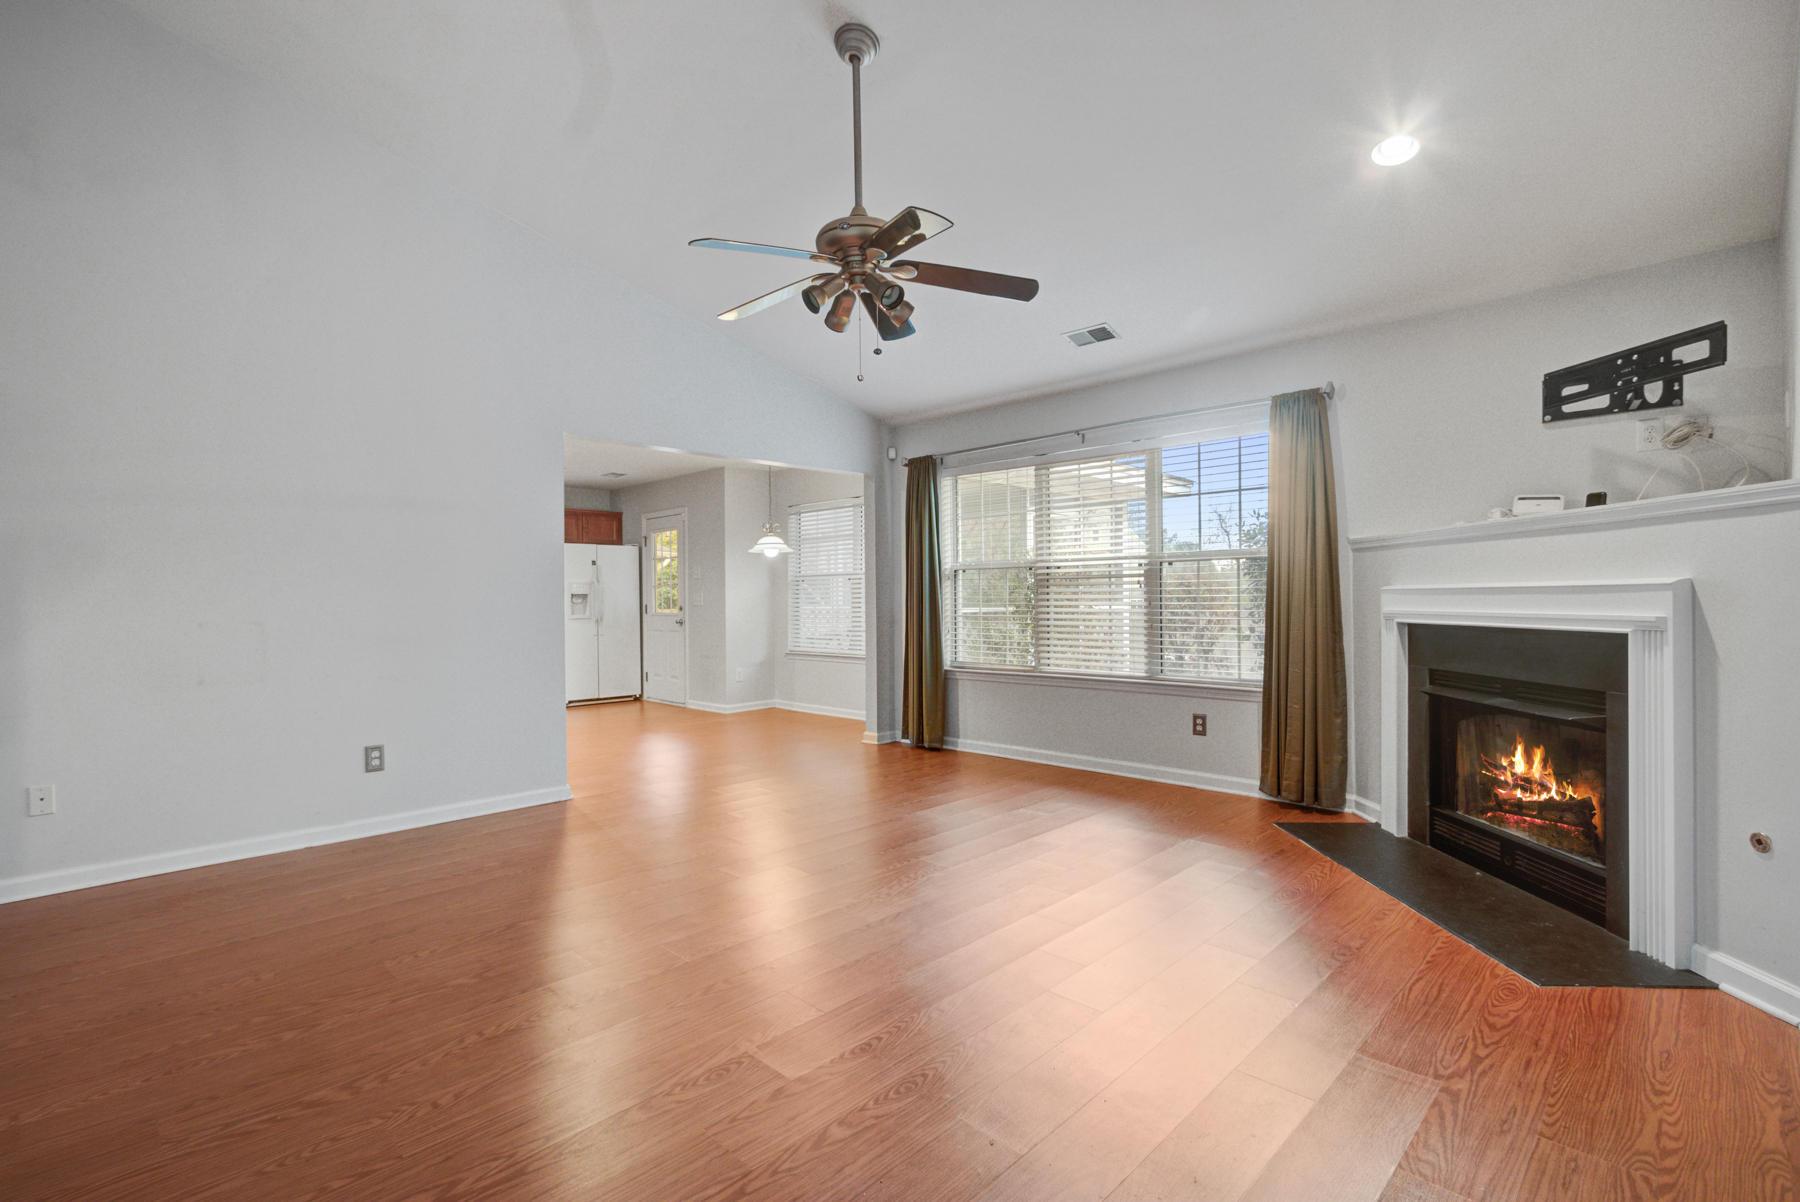 Grand Oaks Plantation Homes For Sale - 564 Hainesworth, Charleston, SC - 10